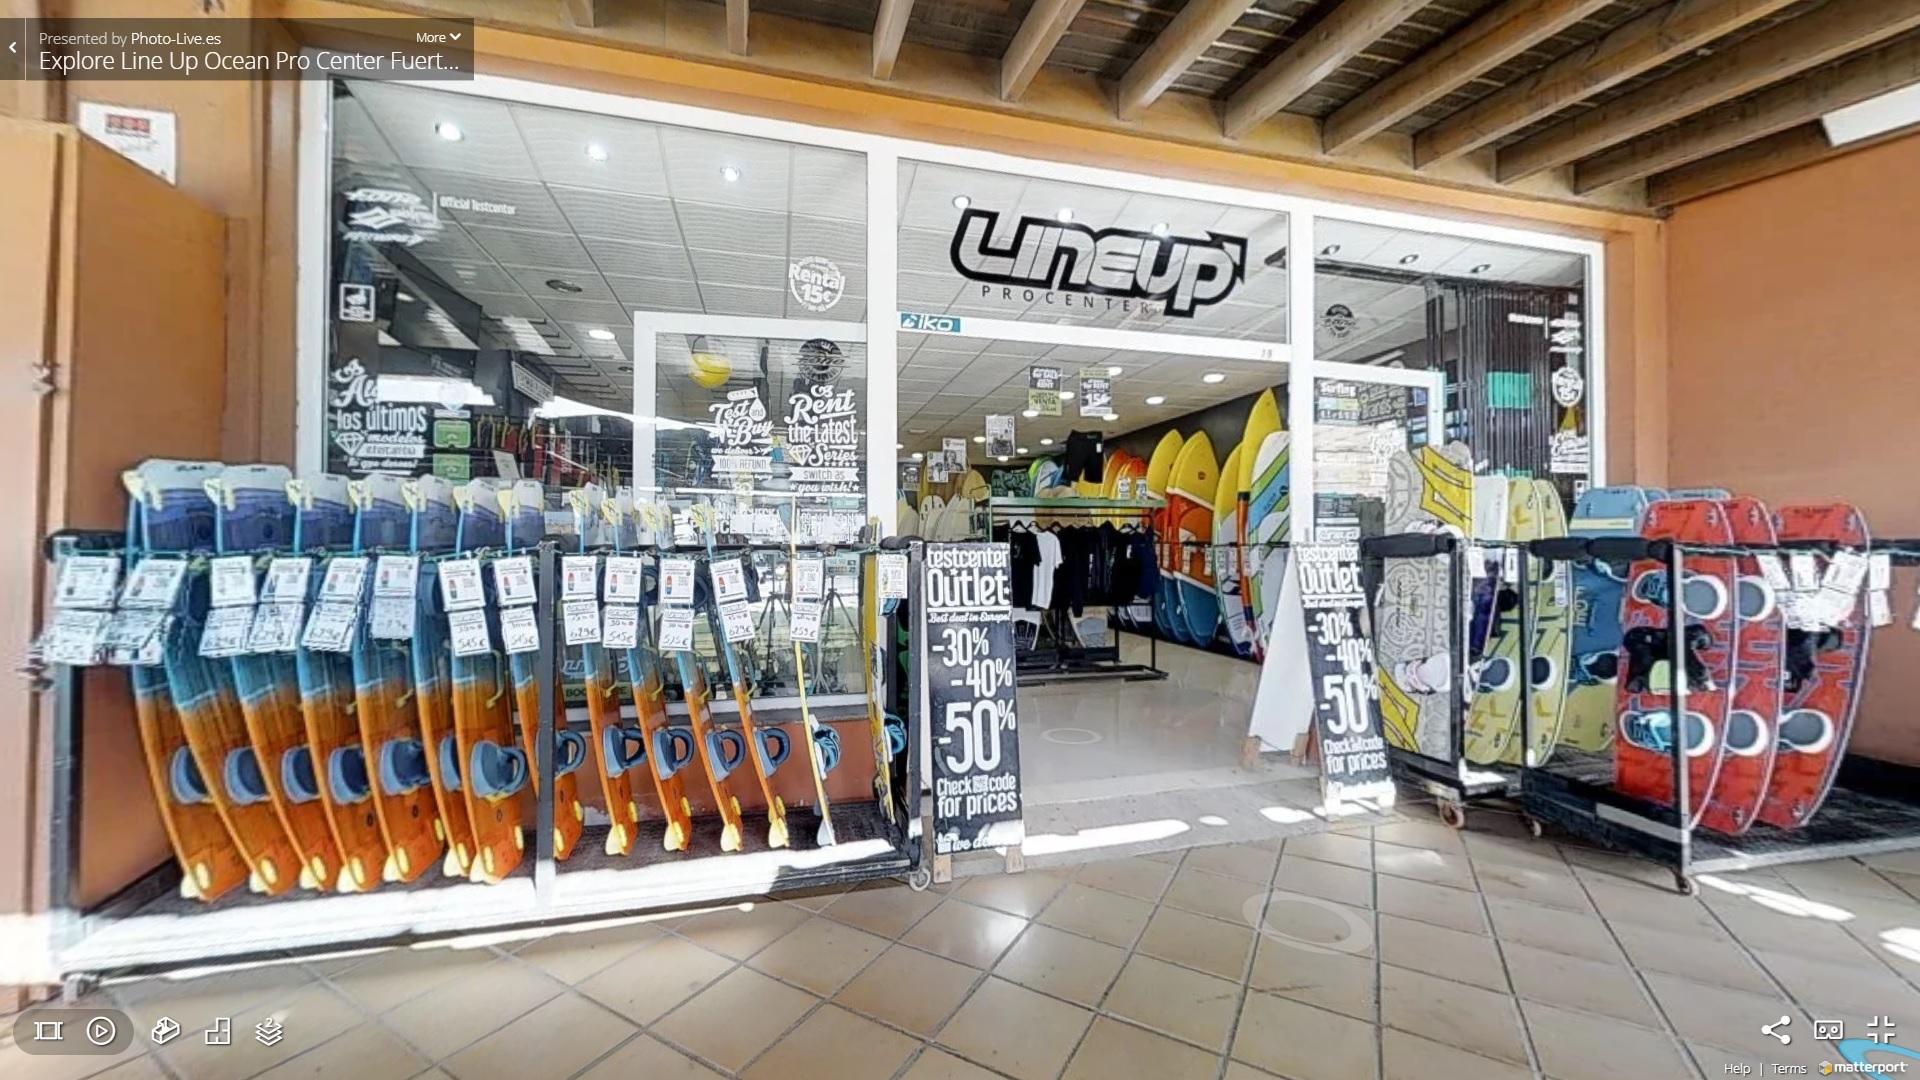 Line Up Surf Store - Corralejo - Fuerteventura